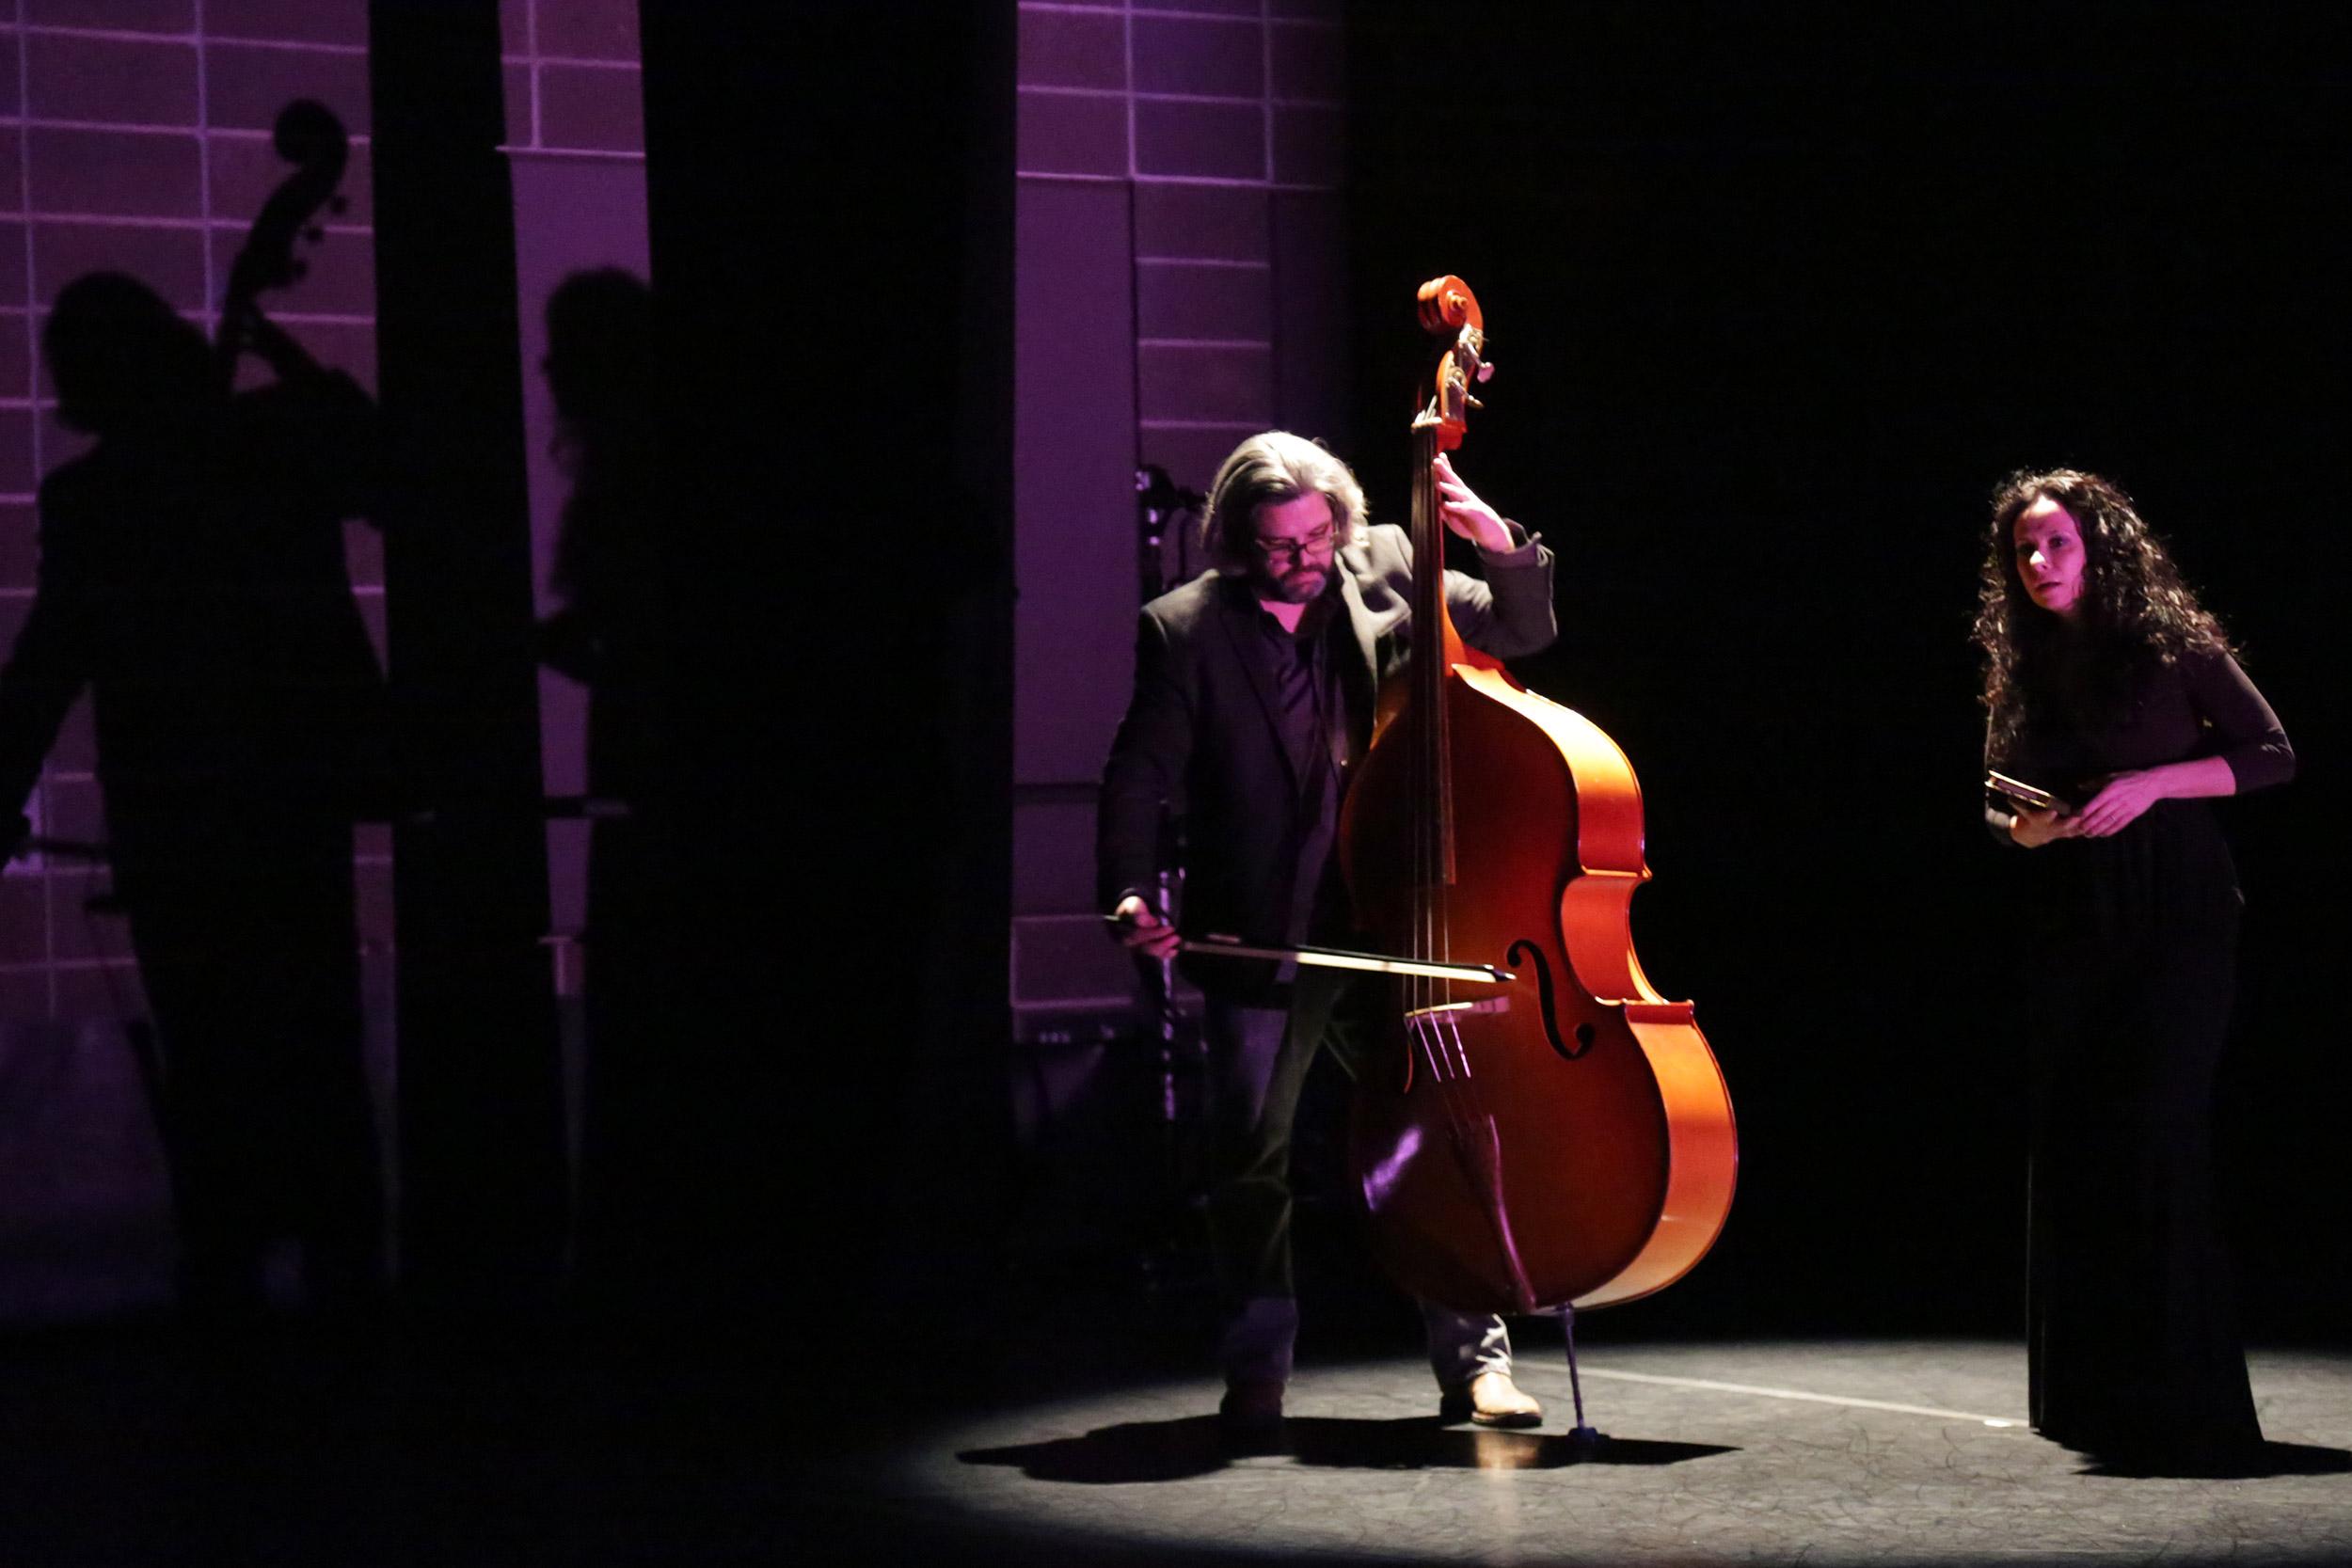 Misha Penton & Brent Fariss. Long Center for the Performing Arts, Austin